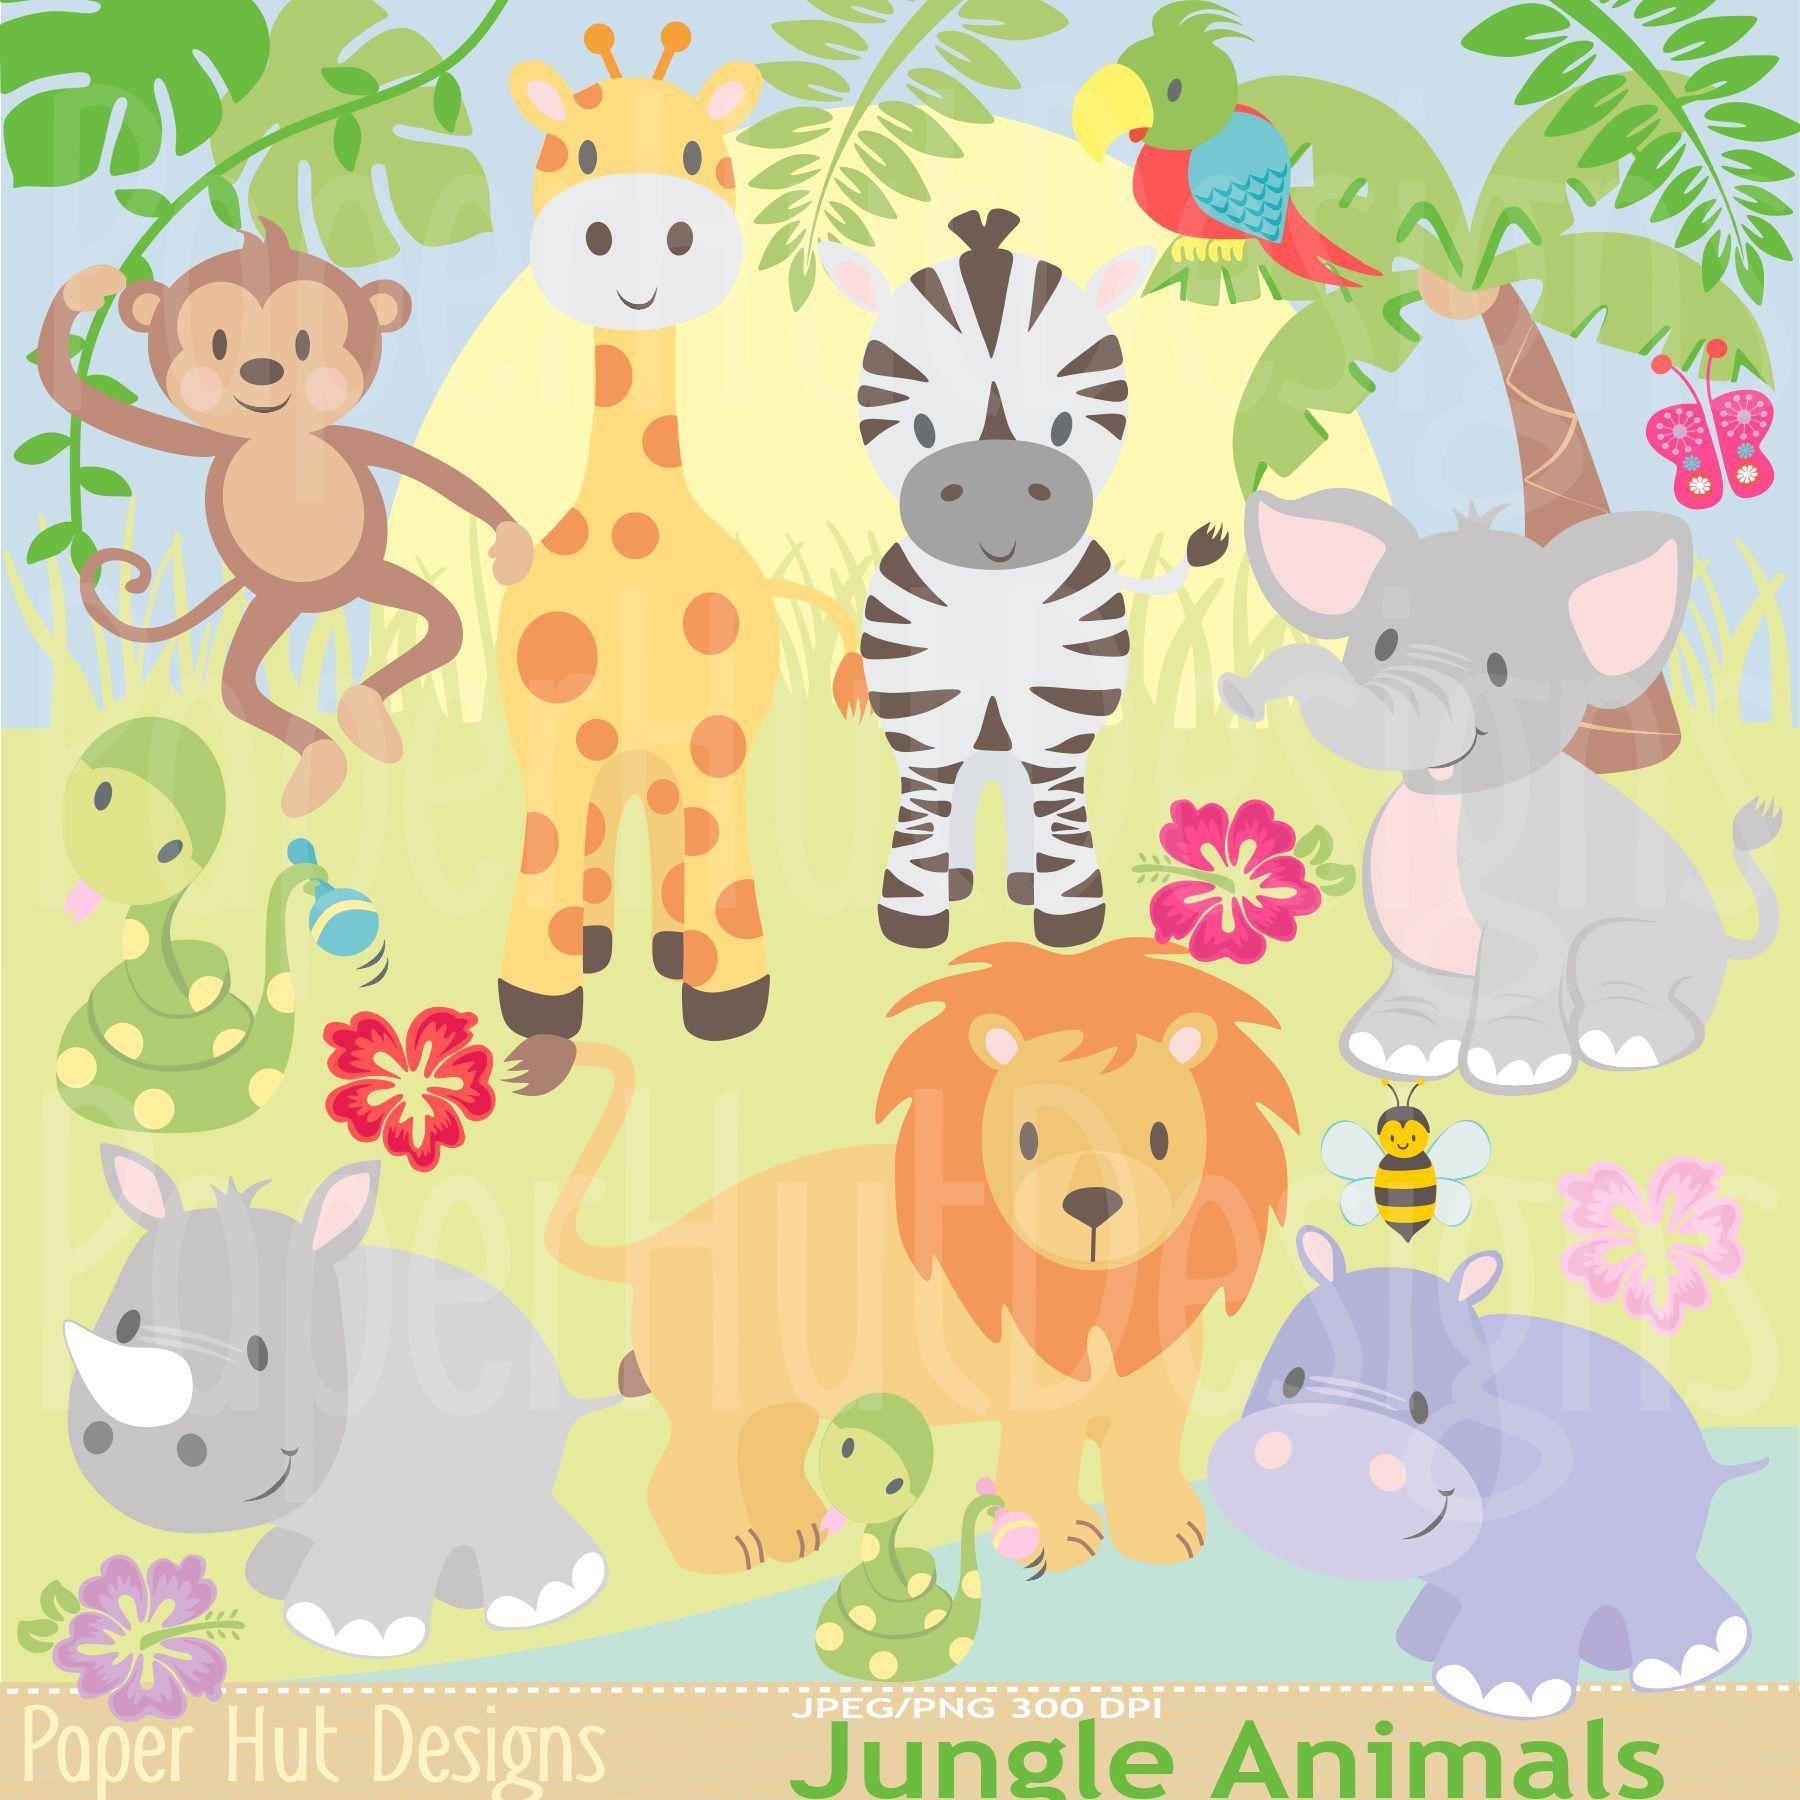 Jungle Animal Clipart Safari Clipart Jungle Clip Art Zoo Etsy Animal Clipart Cute Animal Clipart Baby Zoo Animals